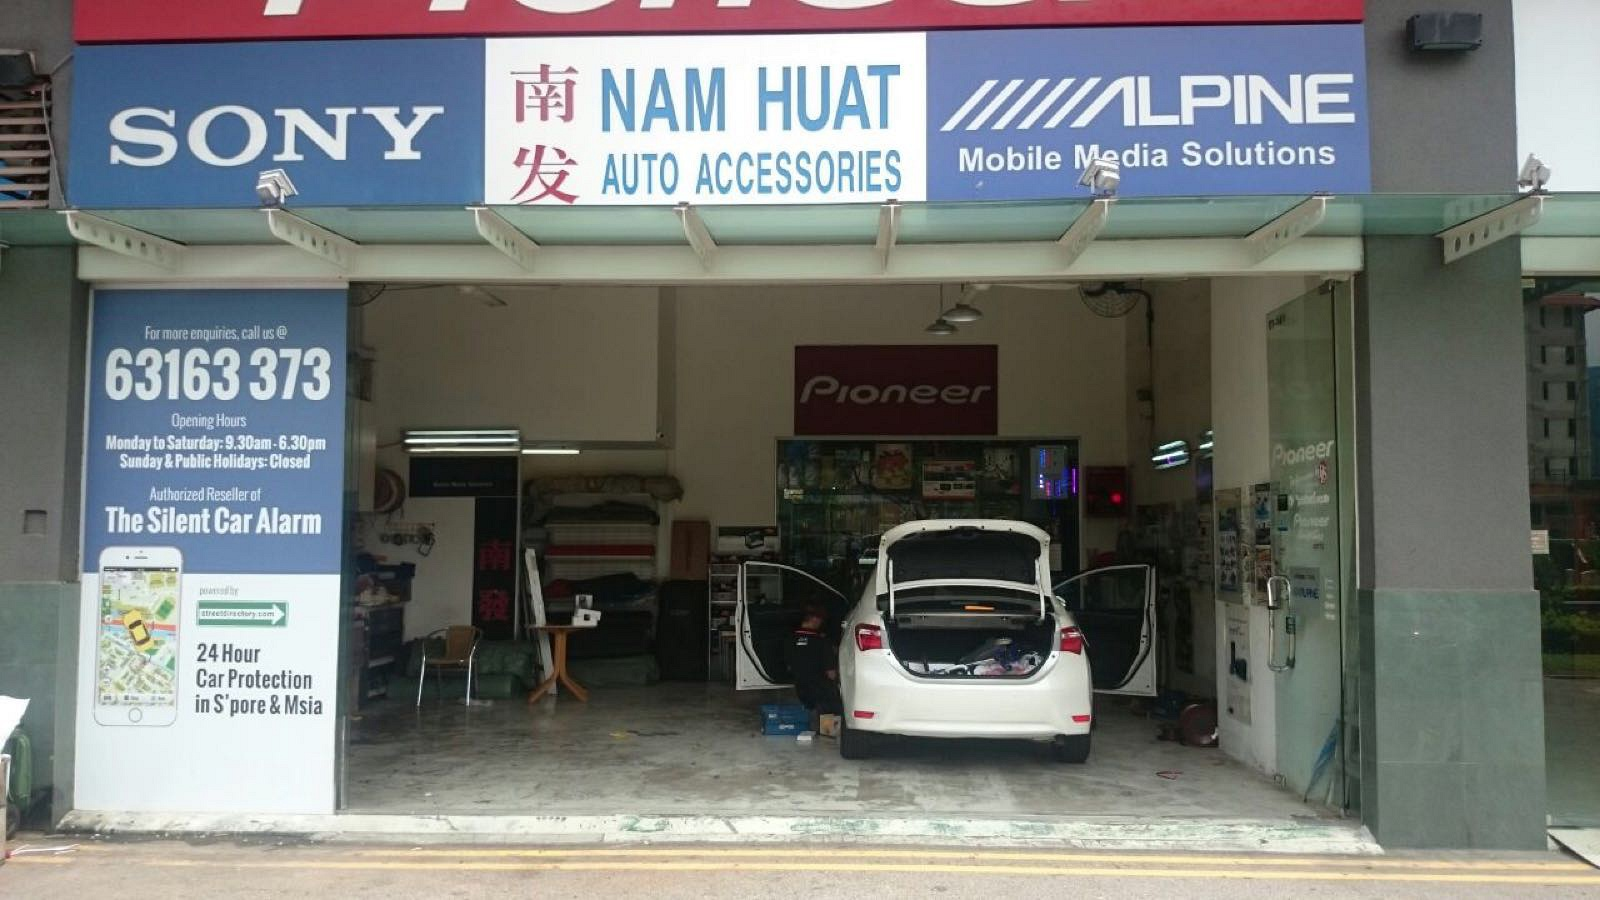 Nam Huat GPS Tracking Expert